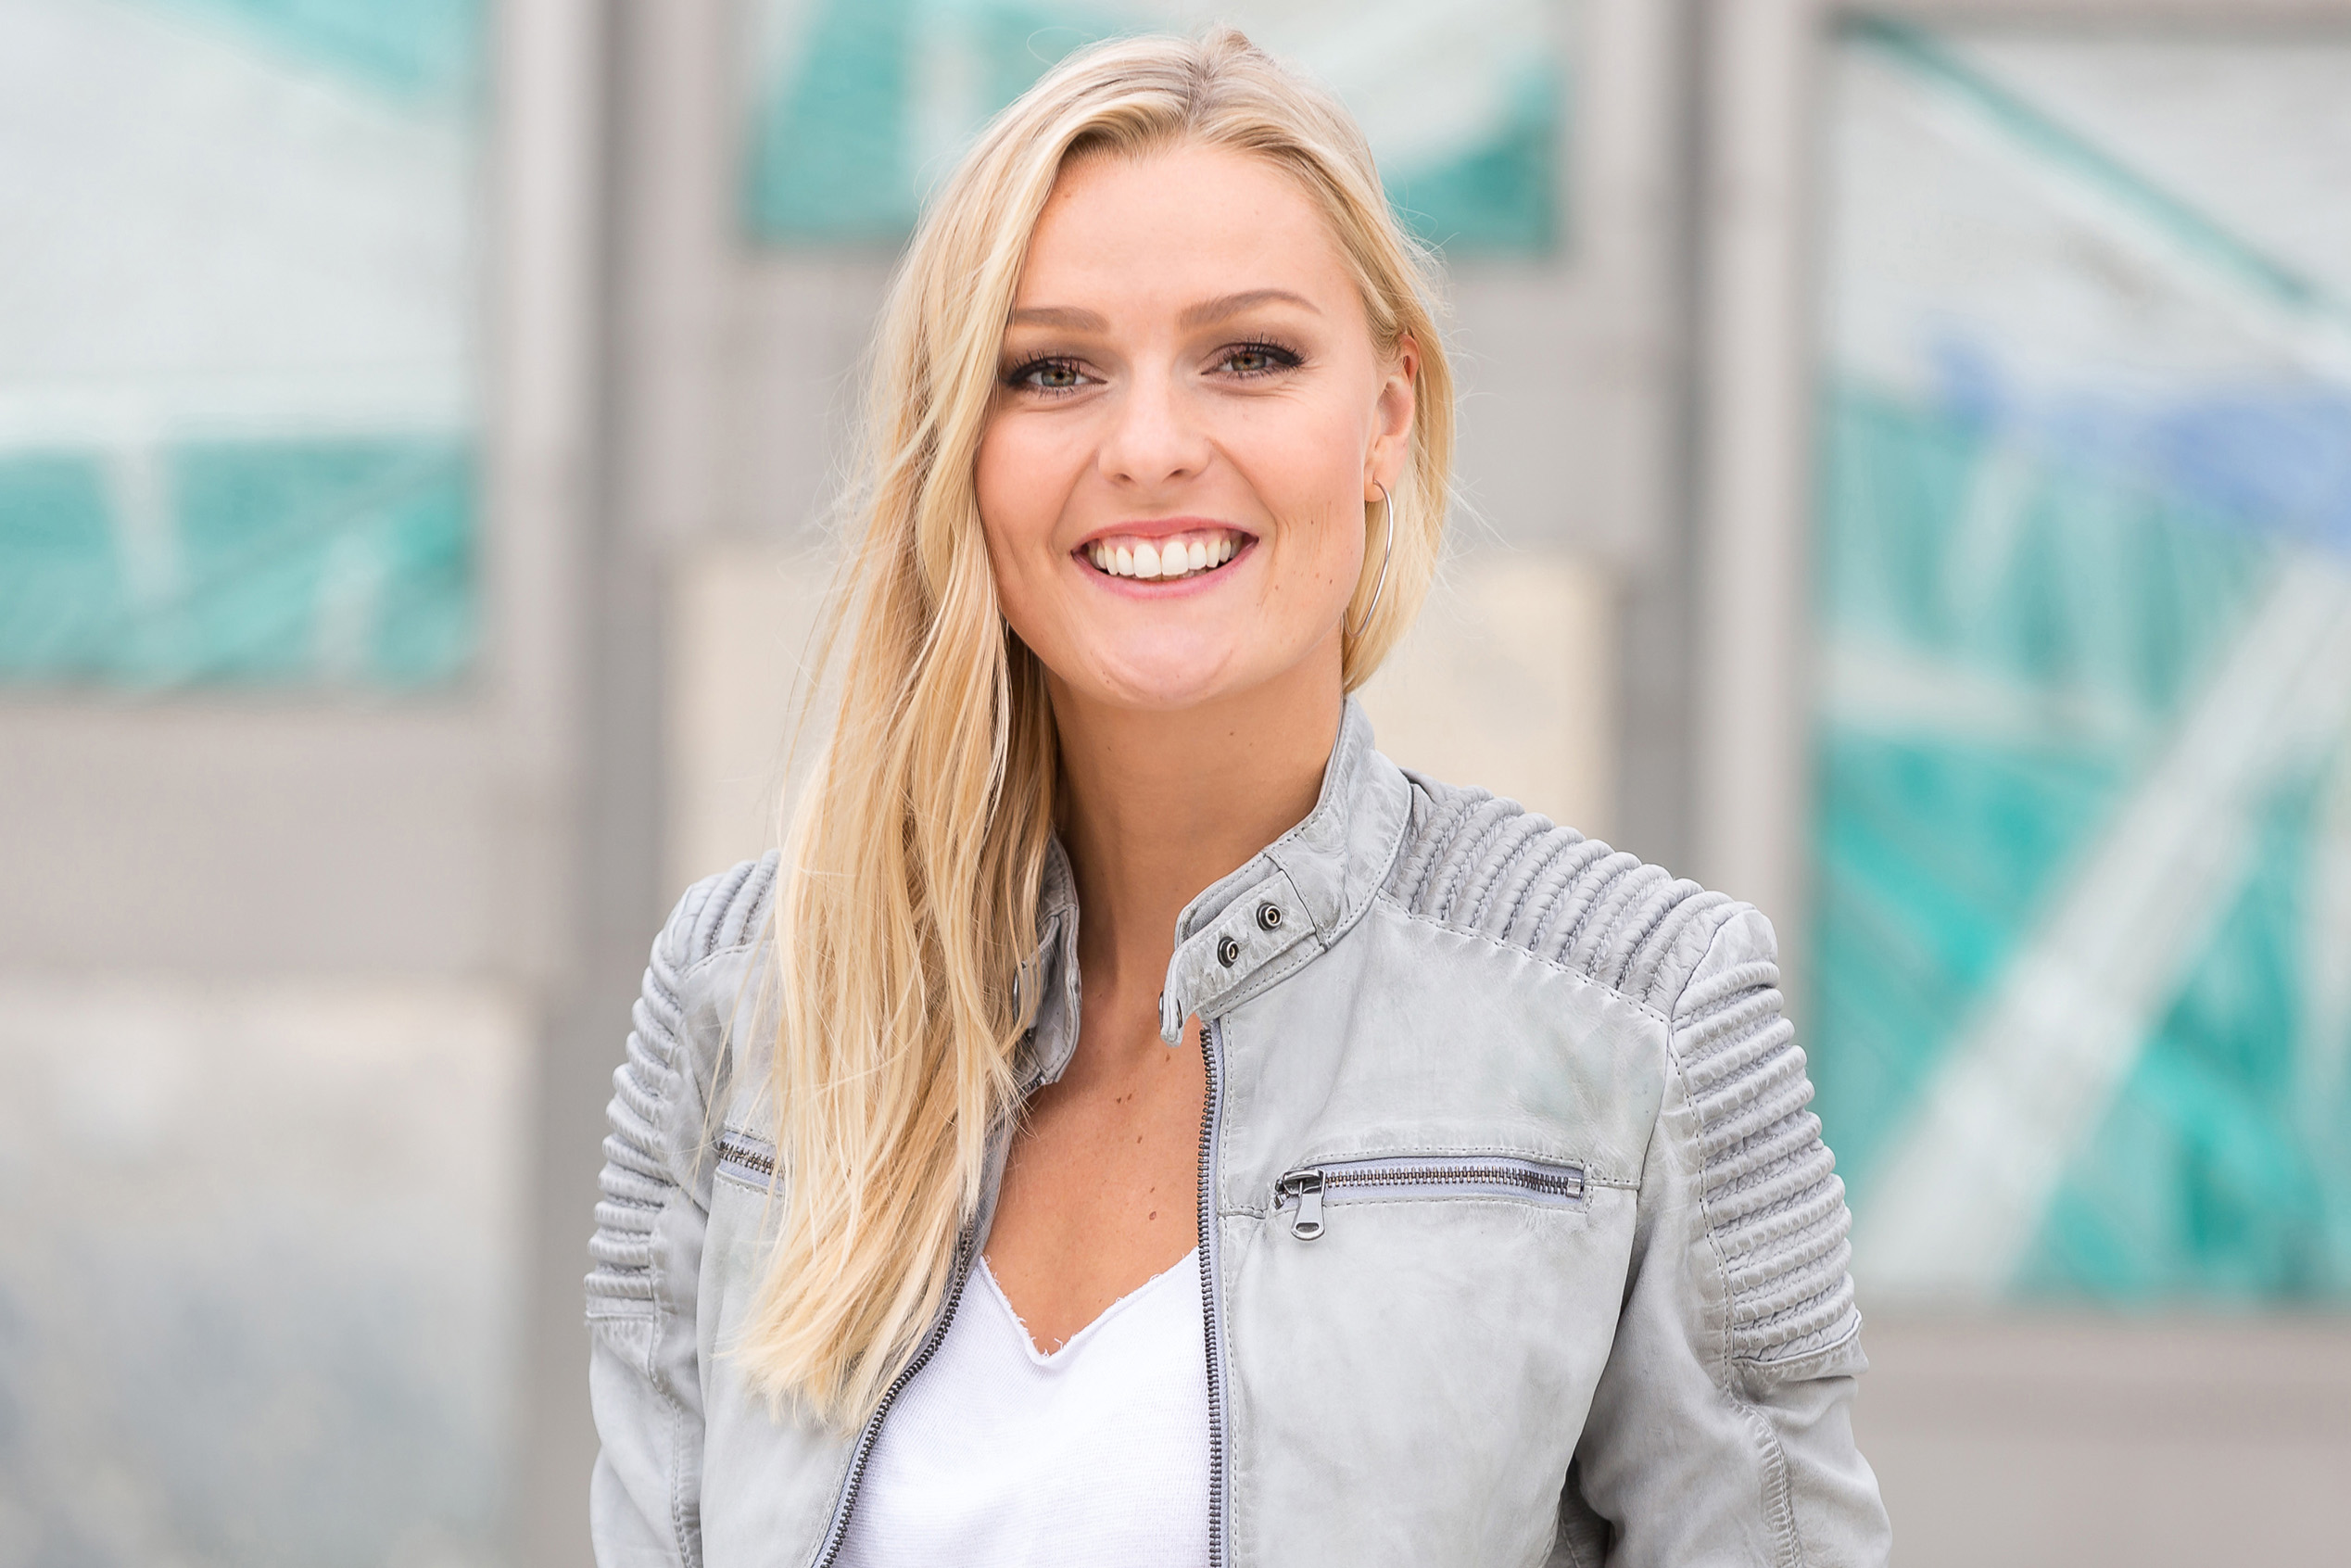 Miriam_Hoeller_Ex-Stuntfrau_Speakerin_Moderatorin_65